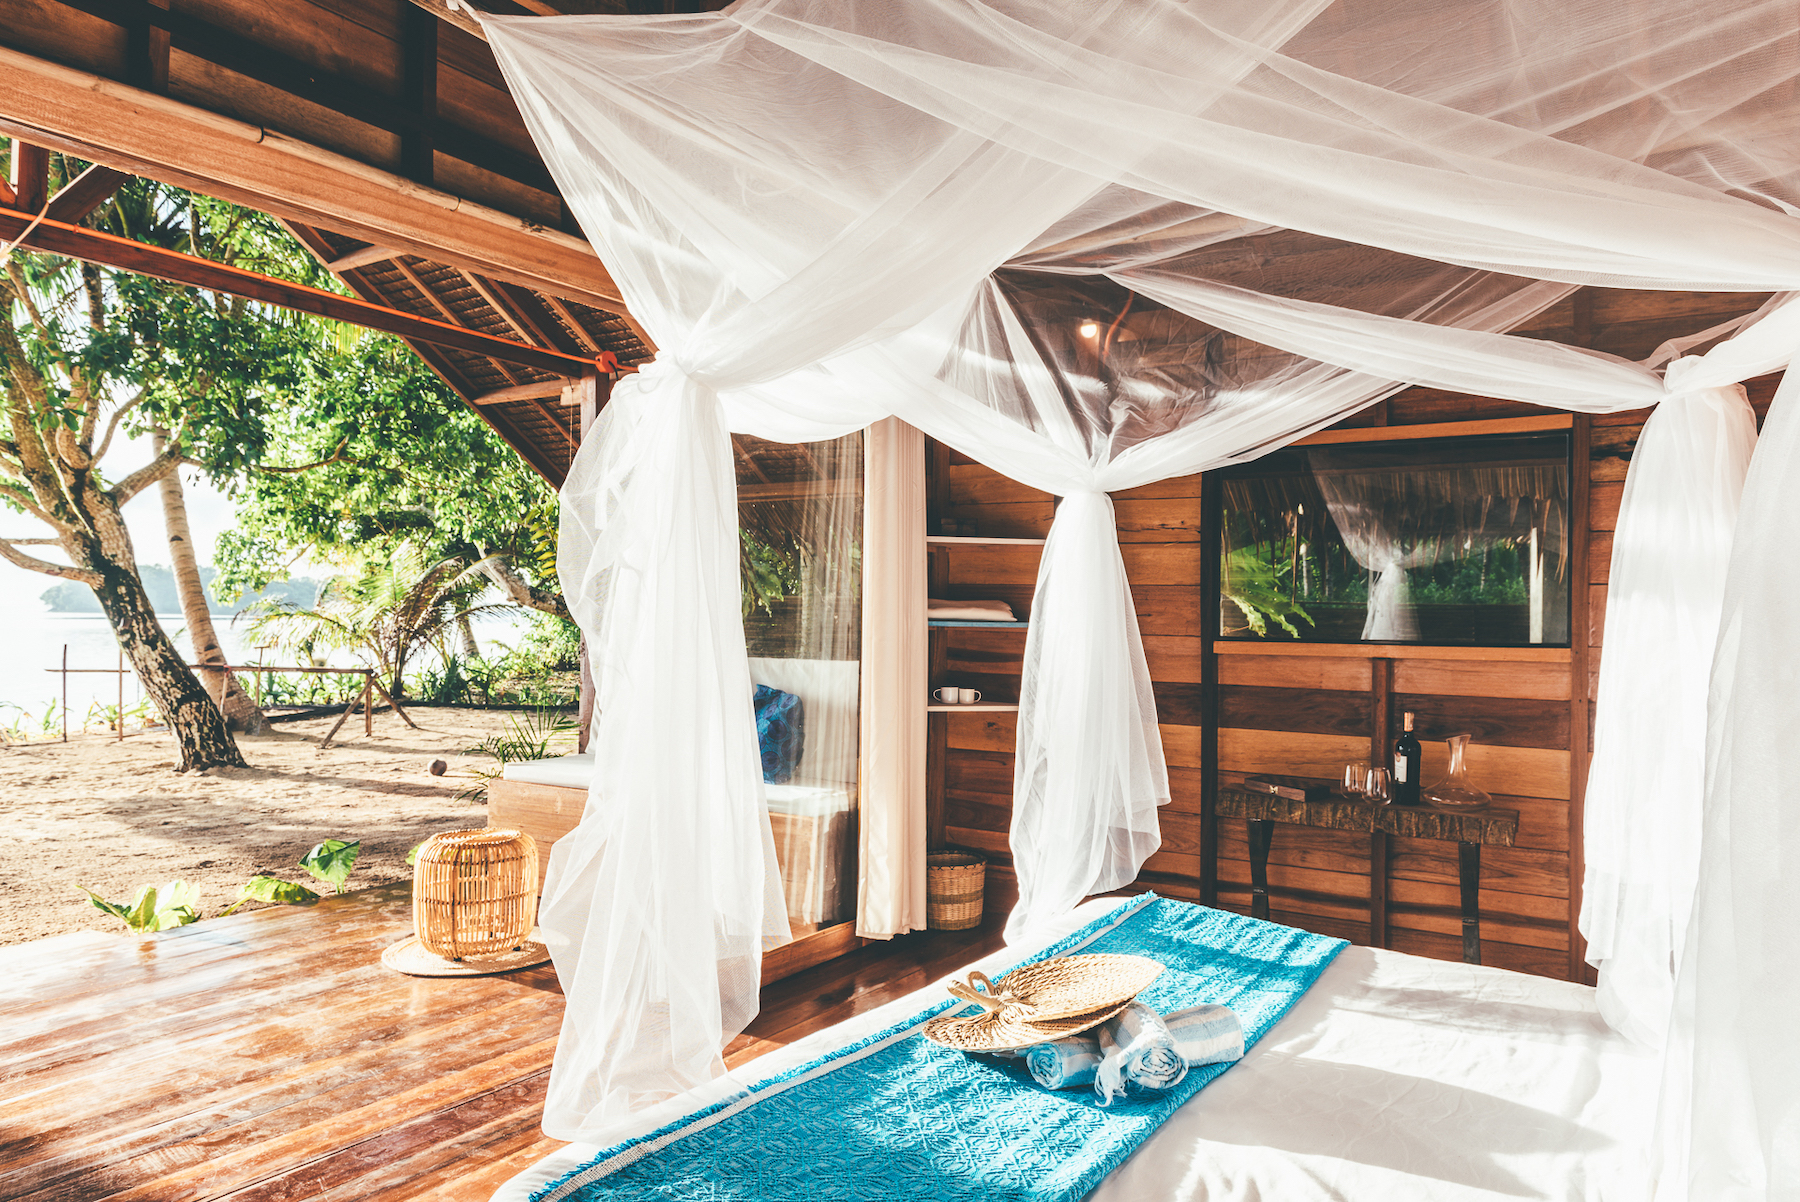 yoga-retreat-siargao-island-cabana-soul-tribe.jpg